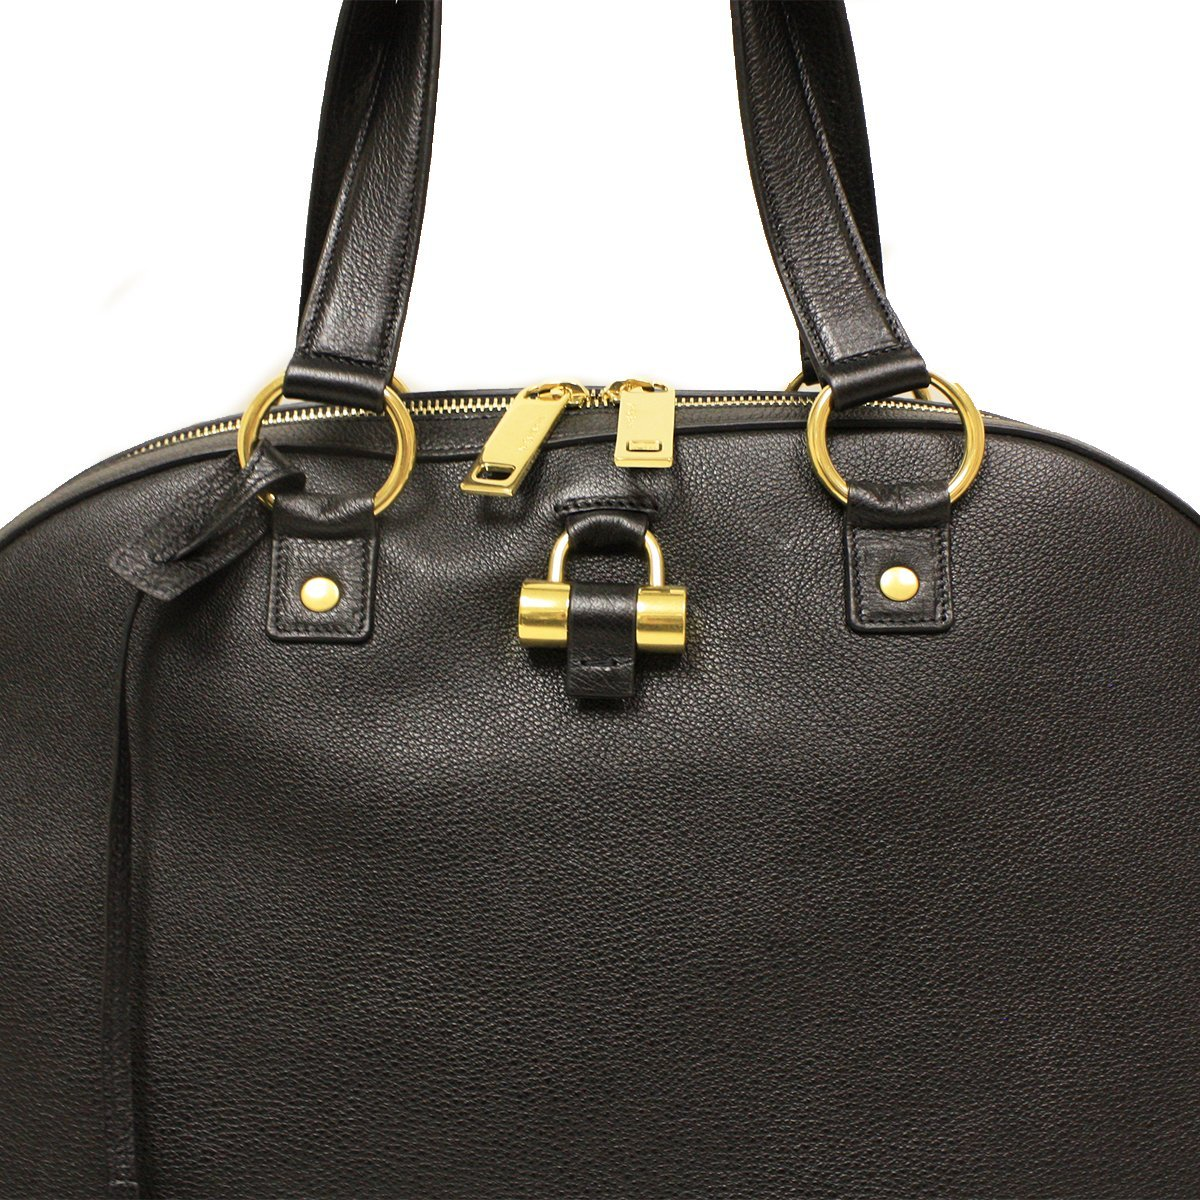 77df5df1c9 Saint Laurent Yves YSL Black Leather Oversized Muse Dome Satchel Top Handle  Shoulder Bag 368220  Amazon.co.uk  Shoes   Bags